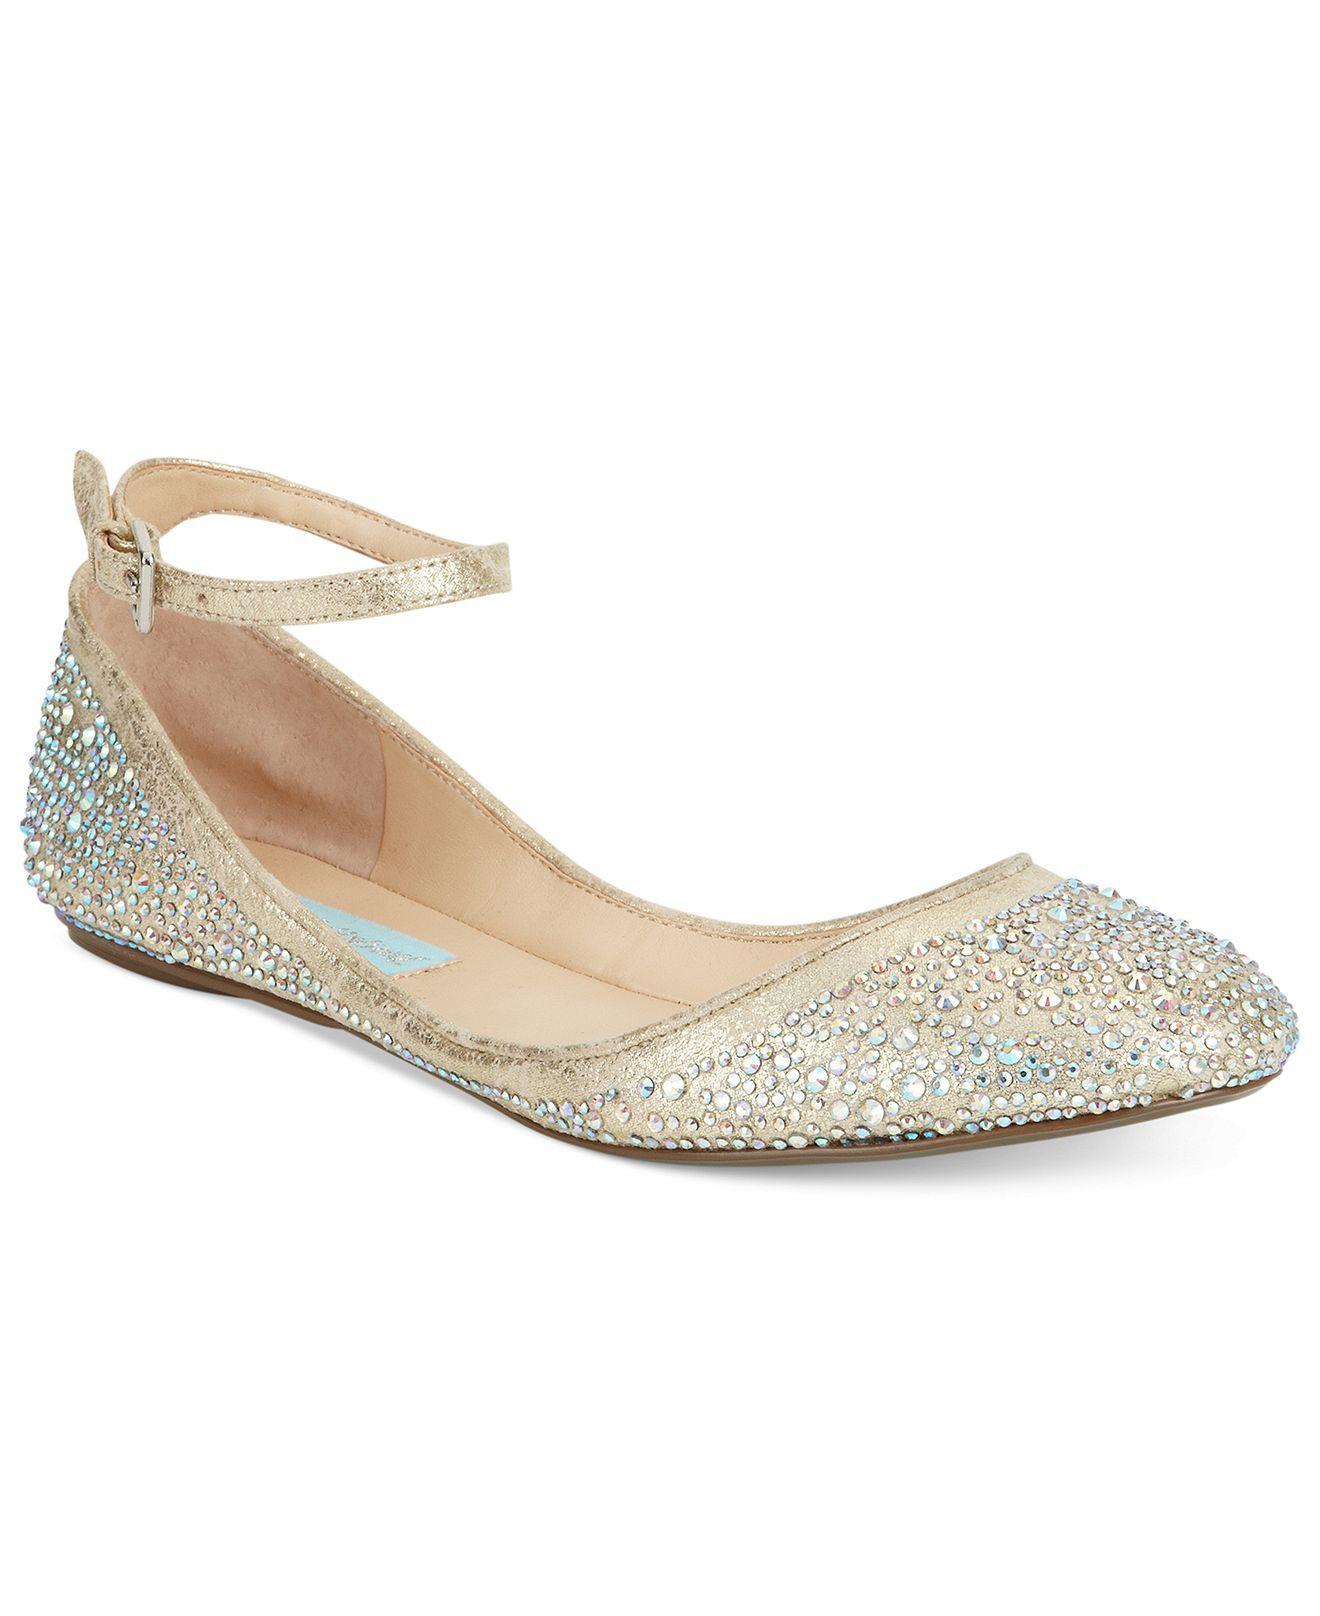 fe852ed8091e Blue by Betsey Johnson Joy Evening Flats - Evening   Bridal - Shoes - Macy s  WEDDING SHOES!